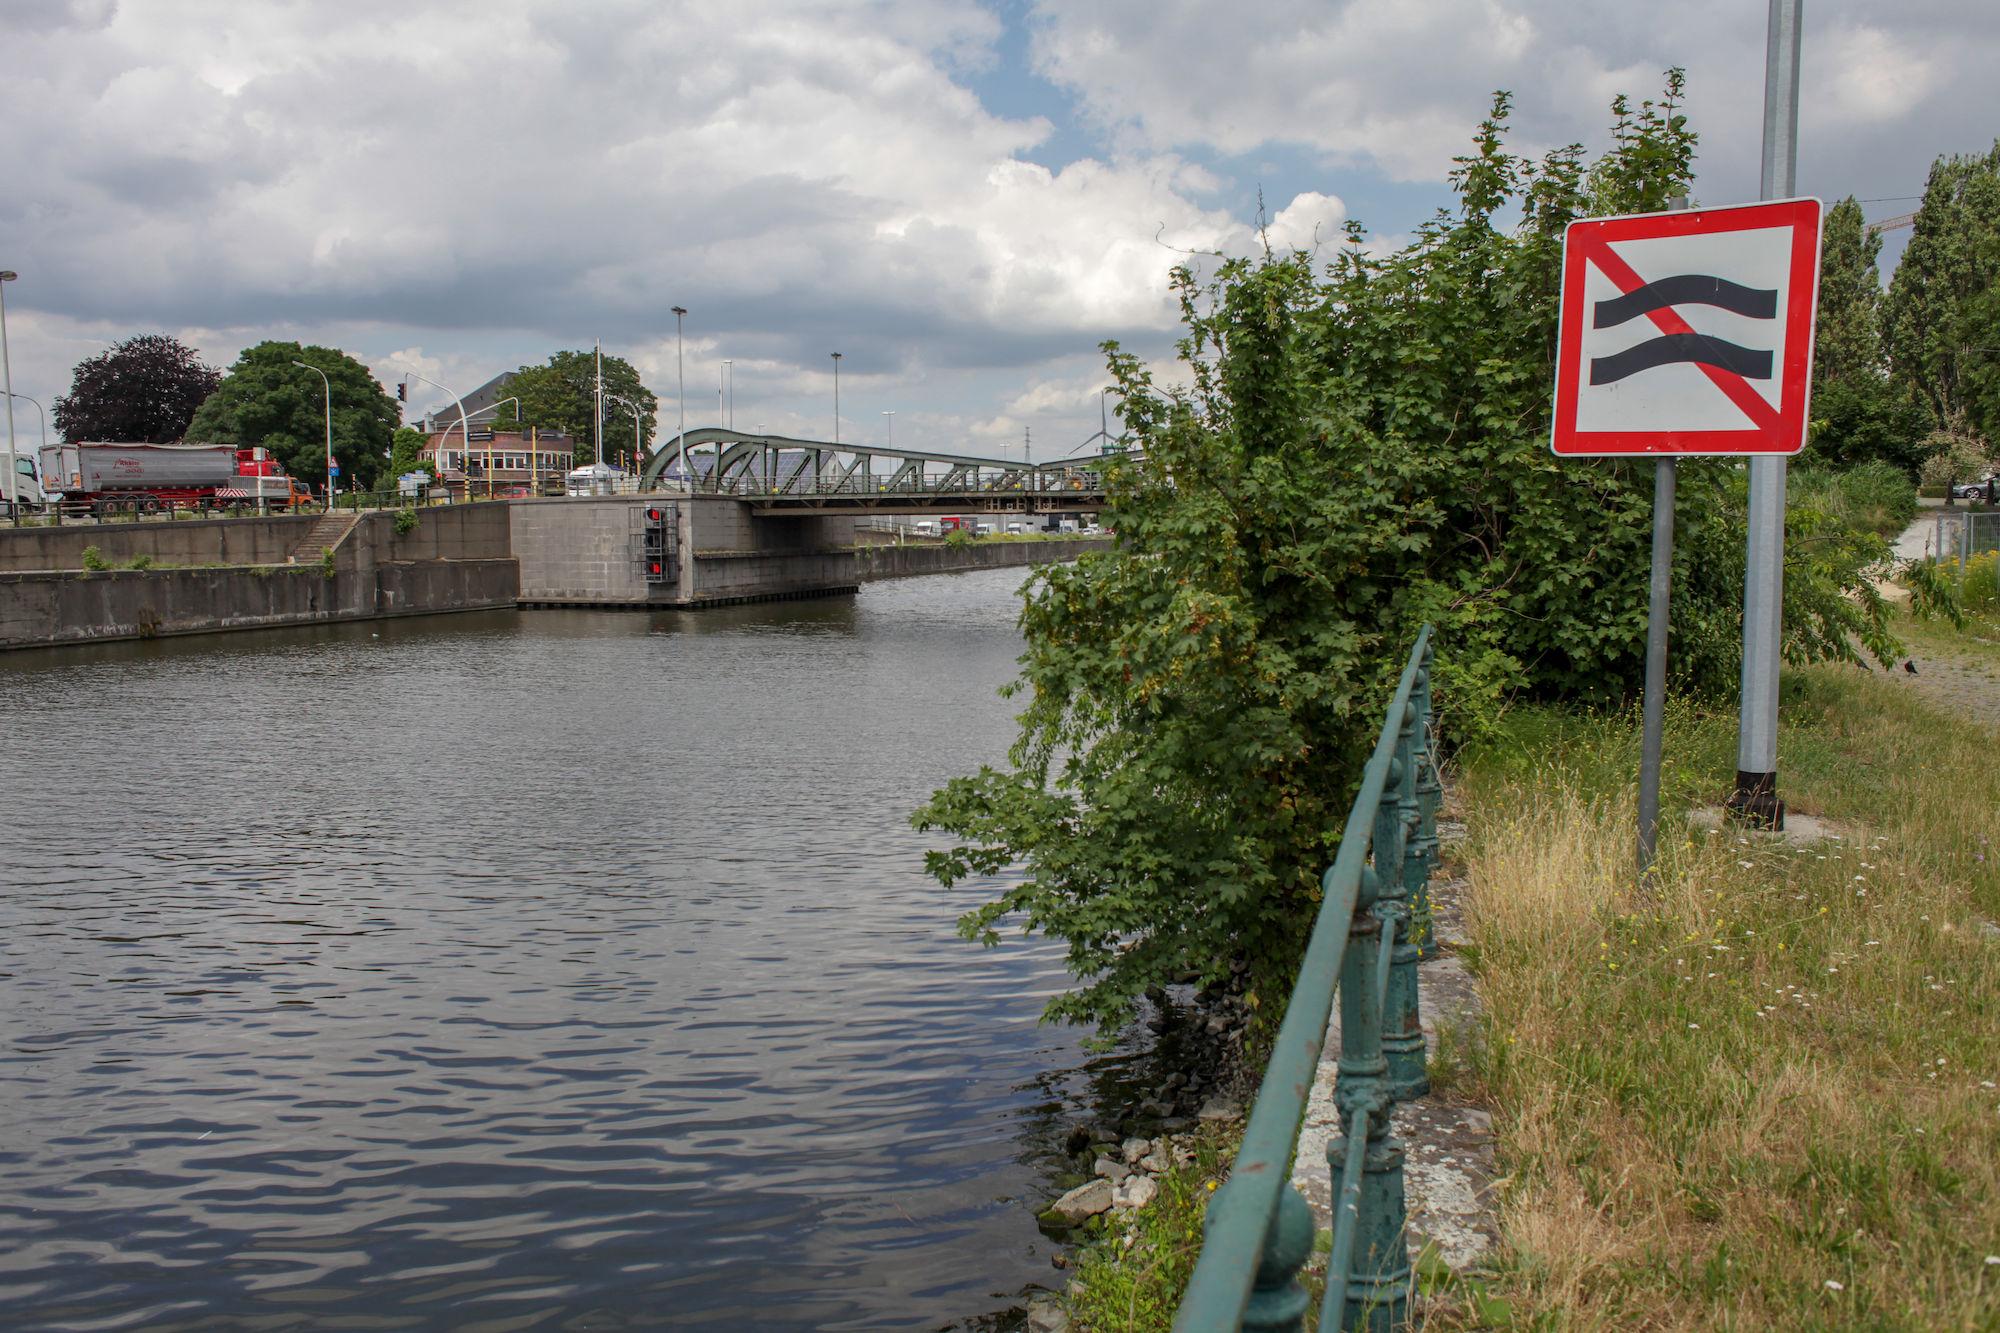 2019-07-02 Muide Meulestede prospectie Wannes_stadsvernieuwing_IMG_0371-3.jpg